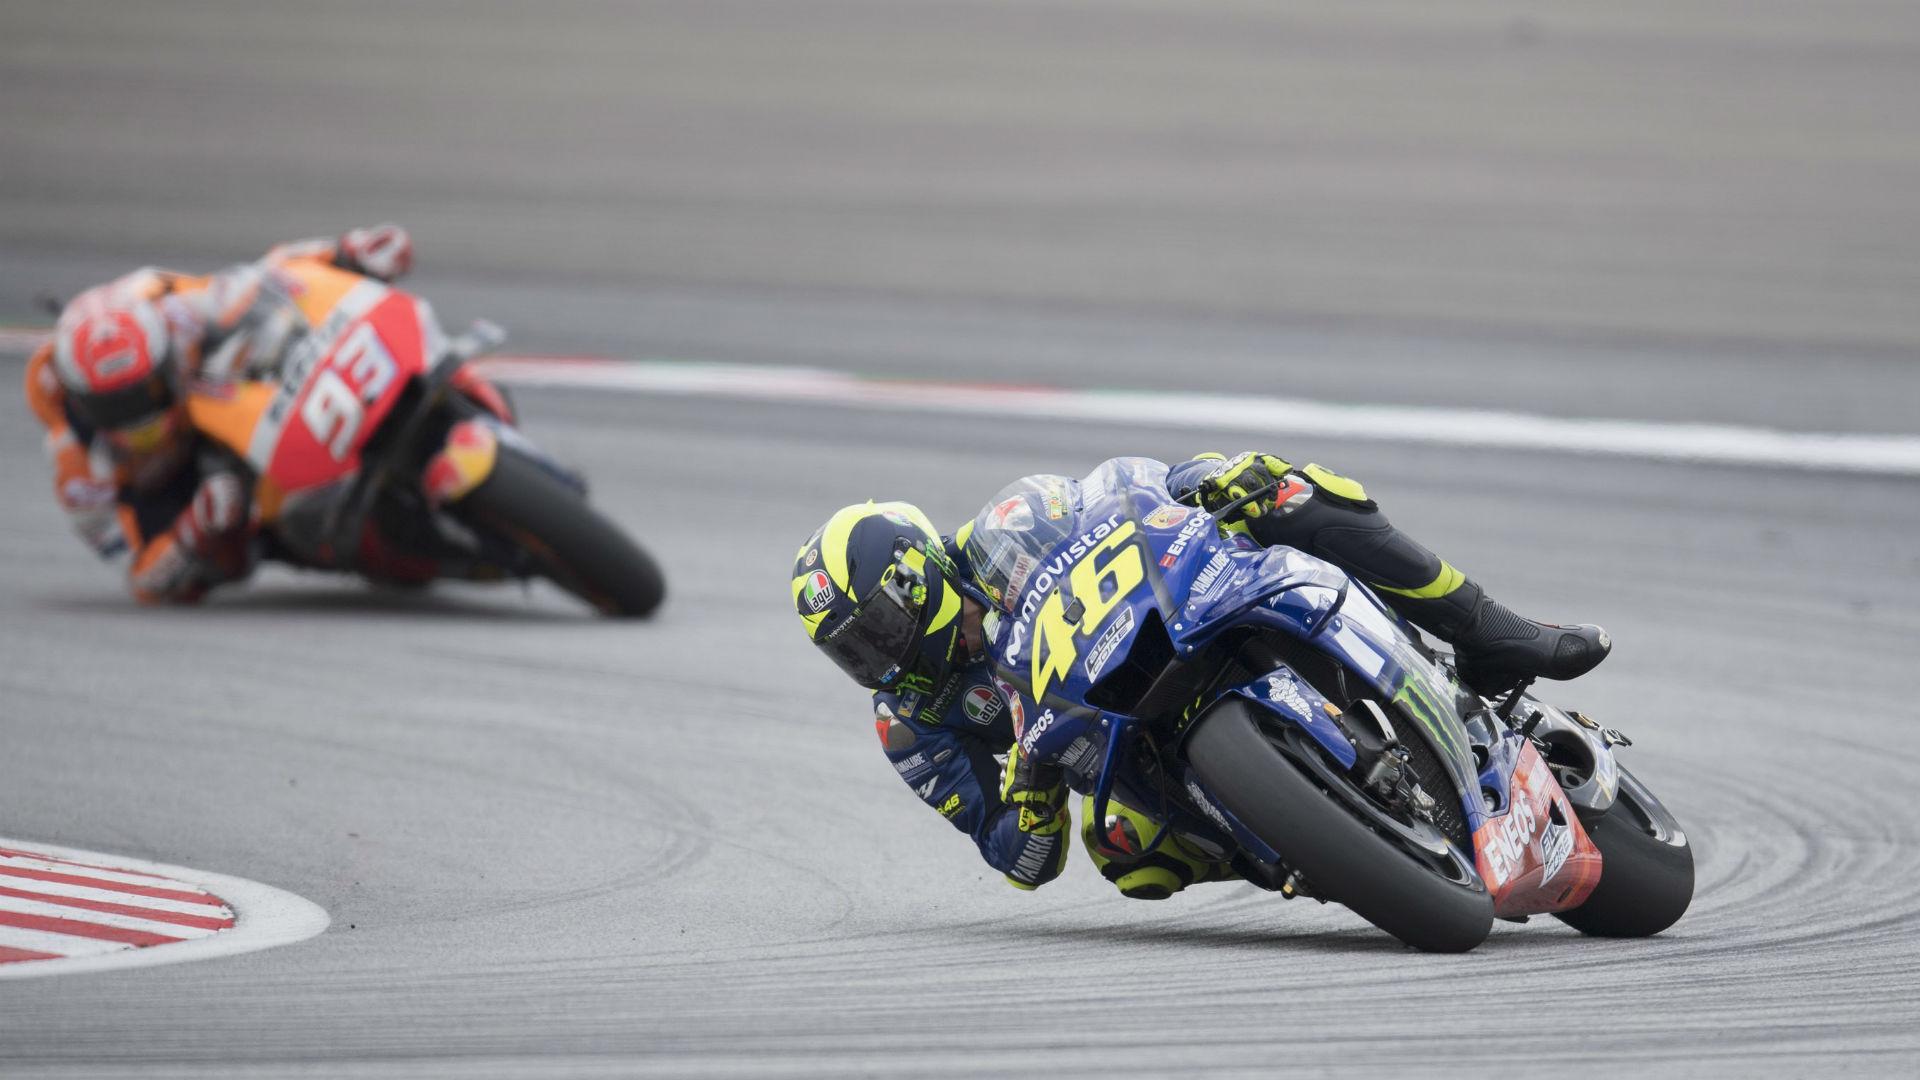 Rossi devastated by Malaysia crash